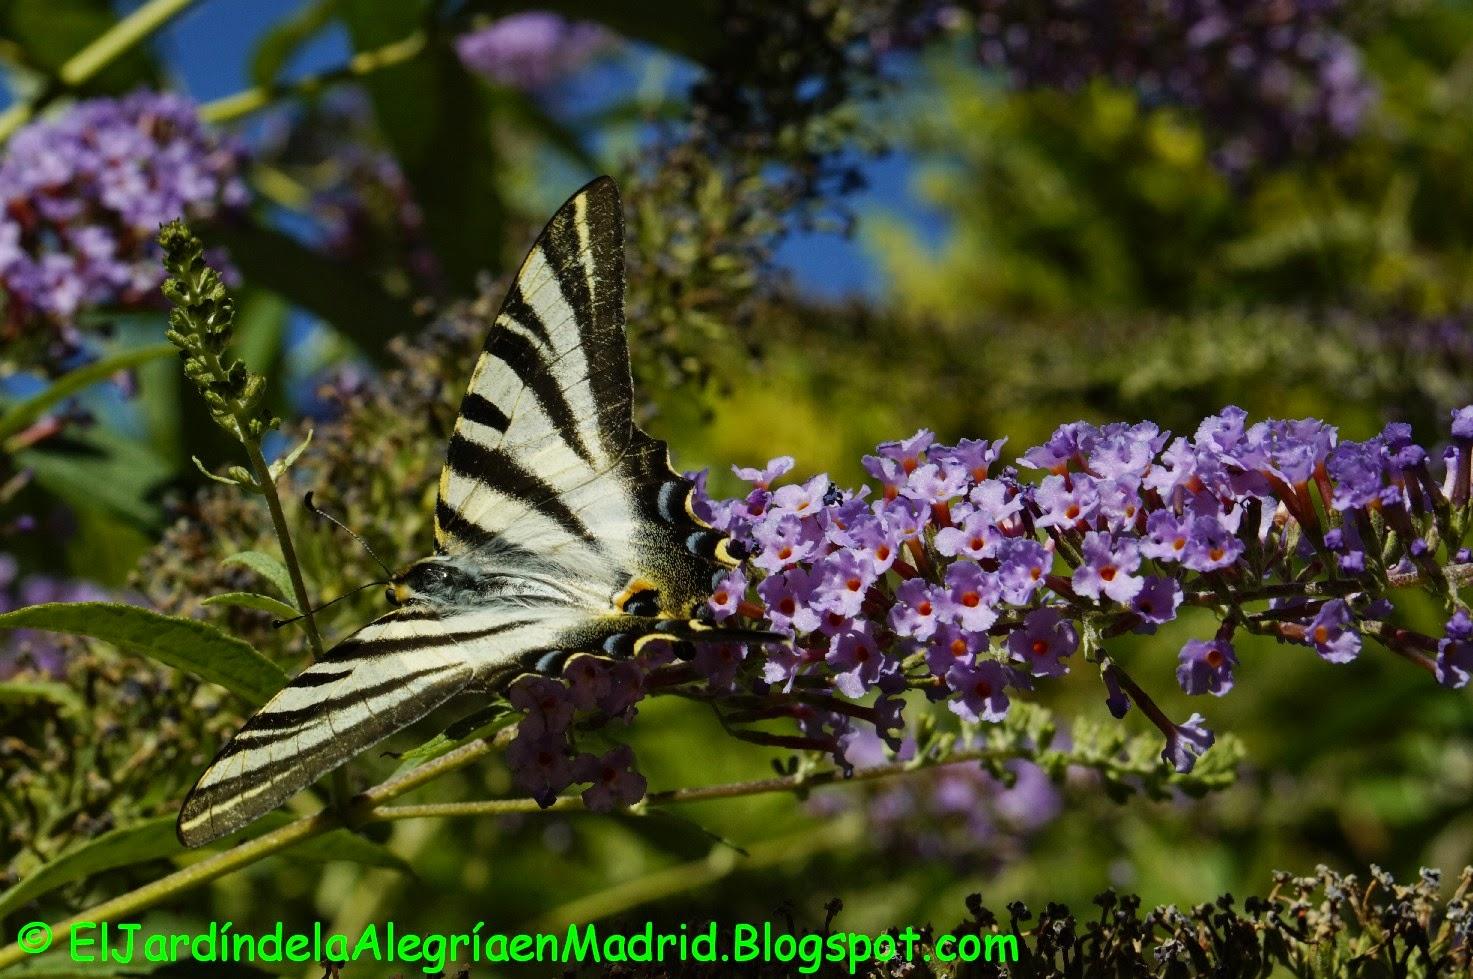 El jard n de la alegr a poda del arbusto de las for Jardin hamel 2015